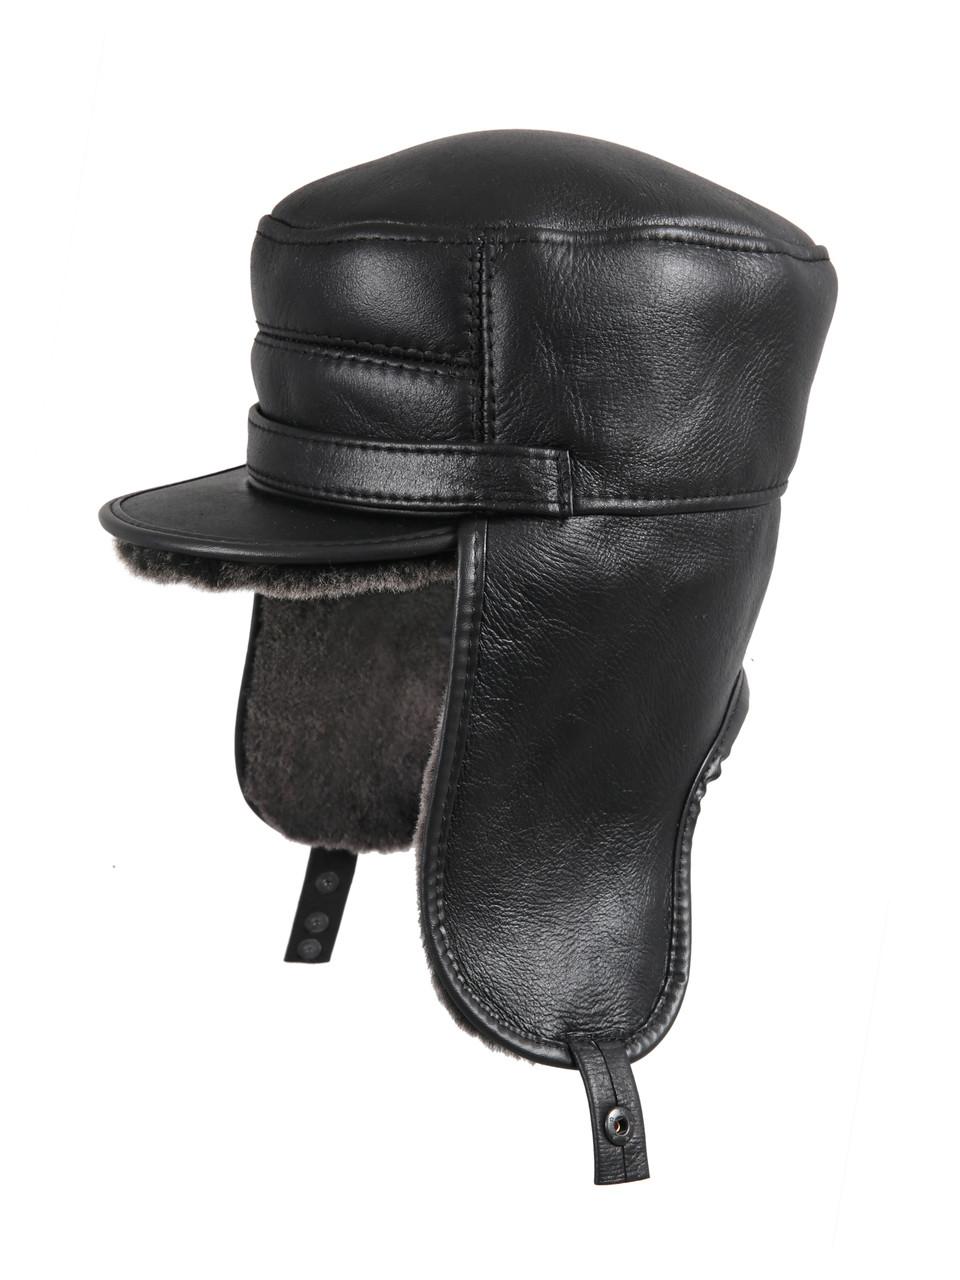 e98ba154489 Shearling Sheepskin Visor Elmer Fudd Winter Fur Hat - Black